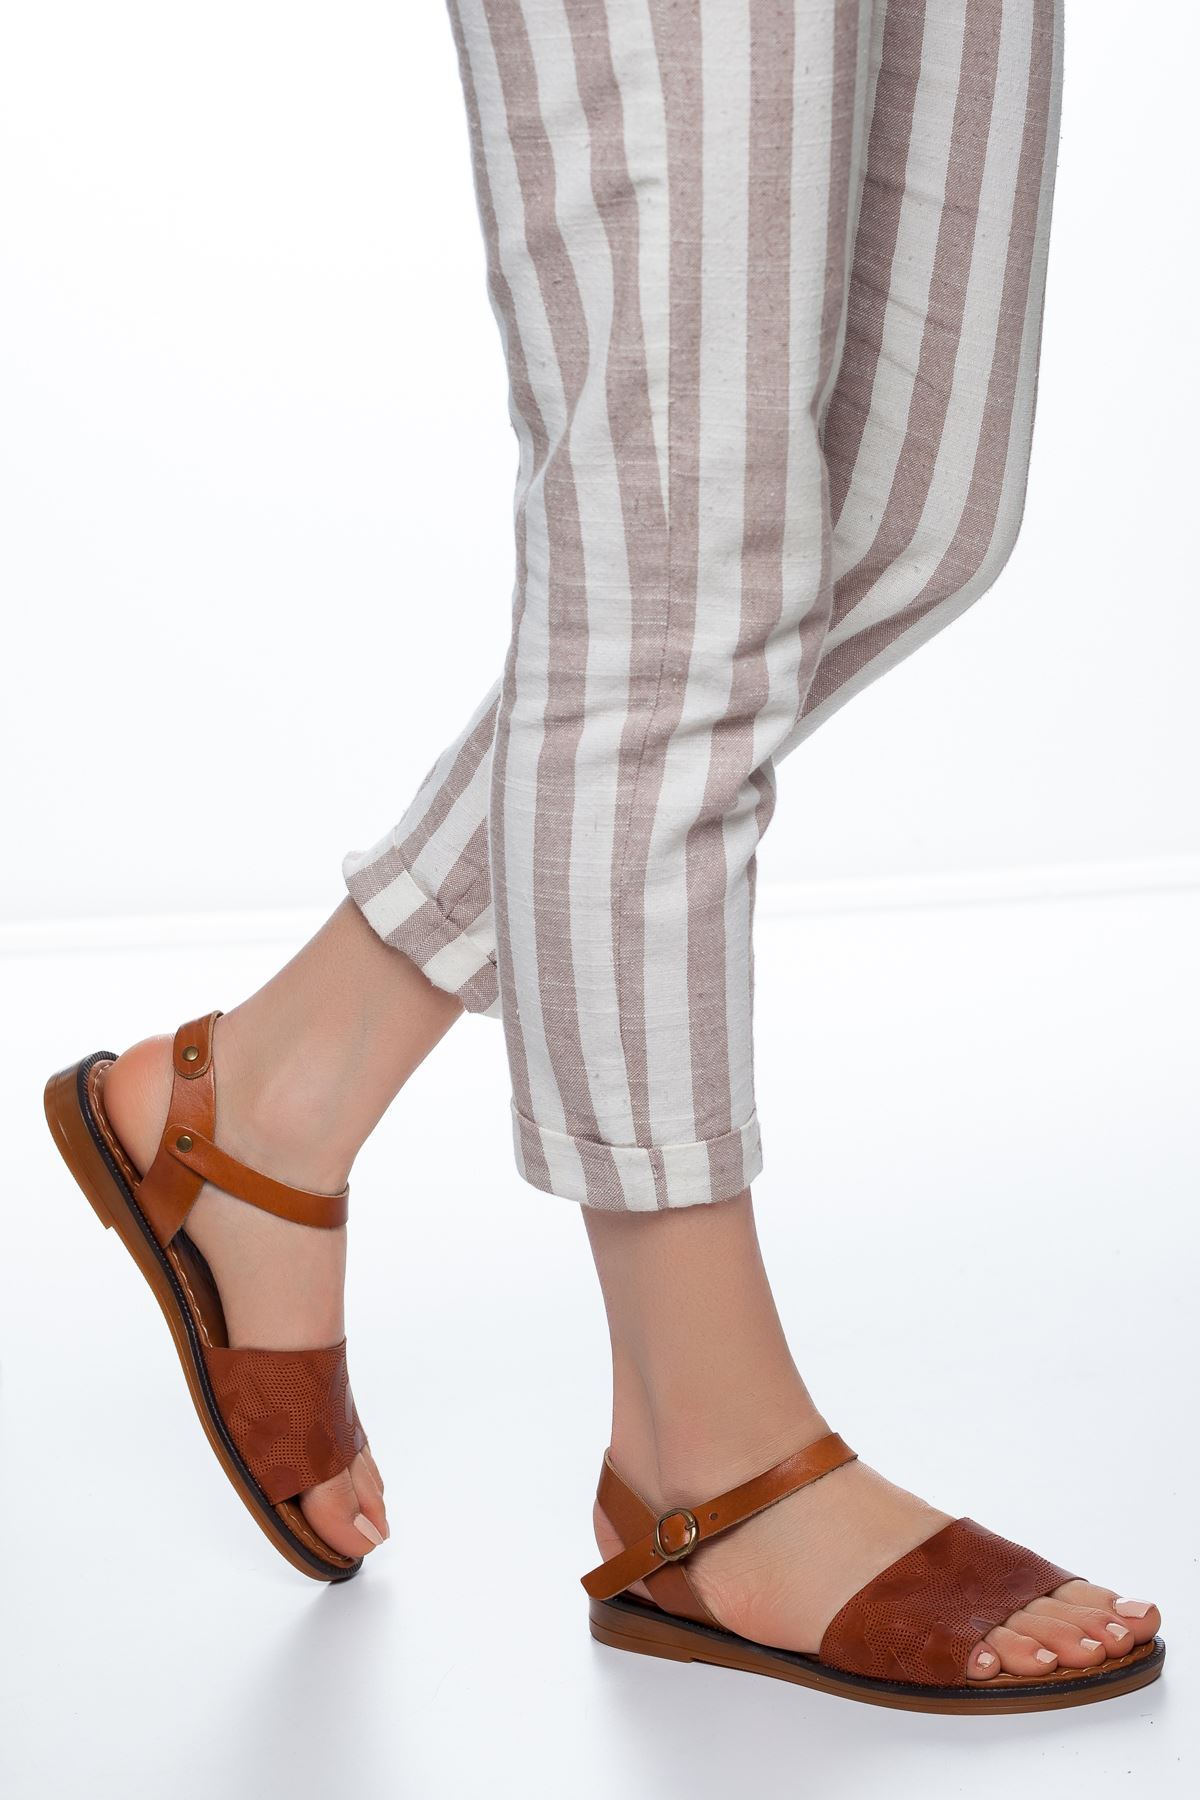 Enya Deri Sandalet Taba